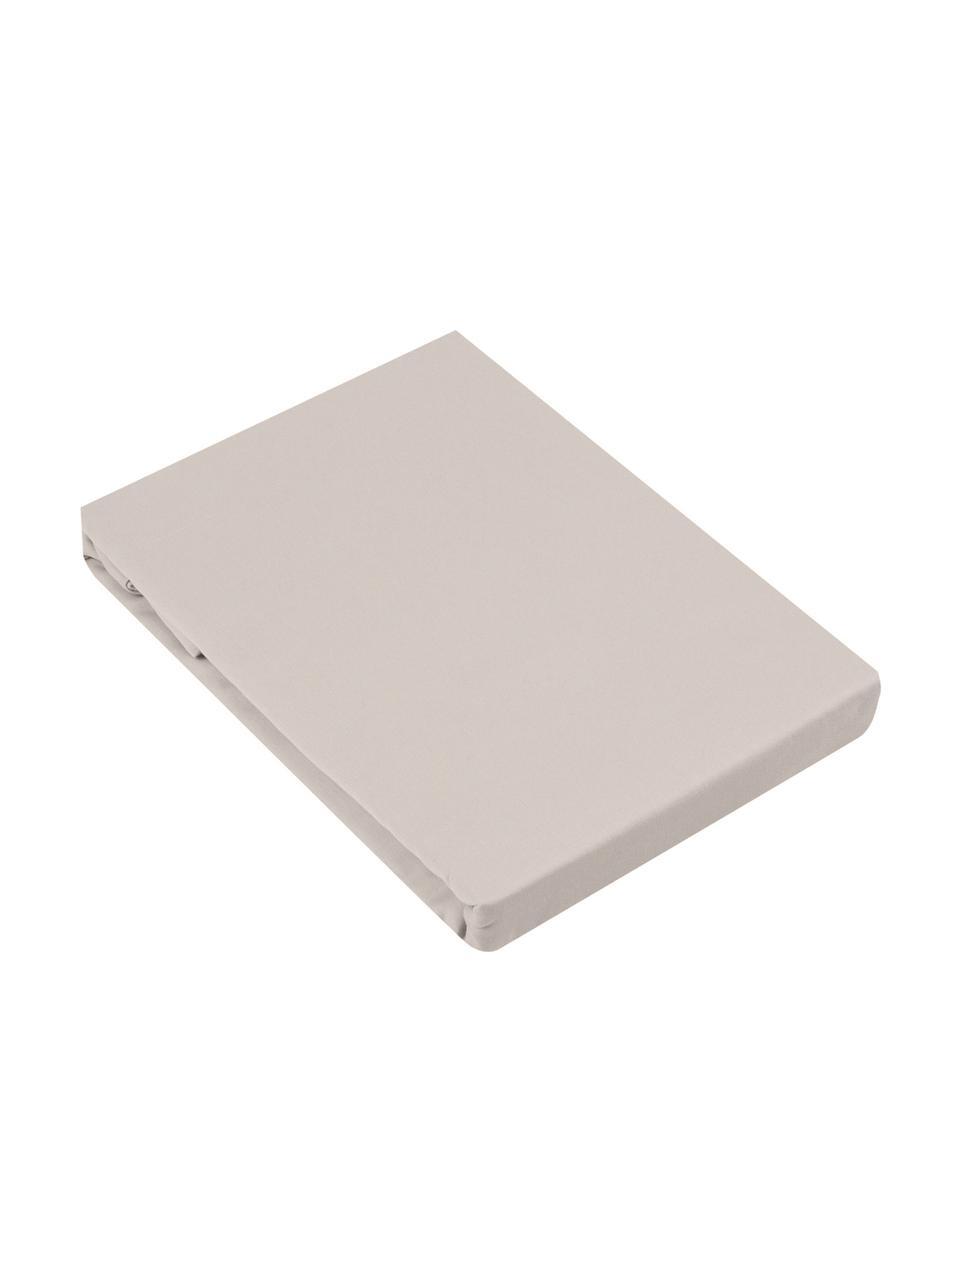 Lenzuolo con angoli in raso di cotone color taupe Comfort, Taupe, Larg. 180 x Lung. 200 cm